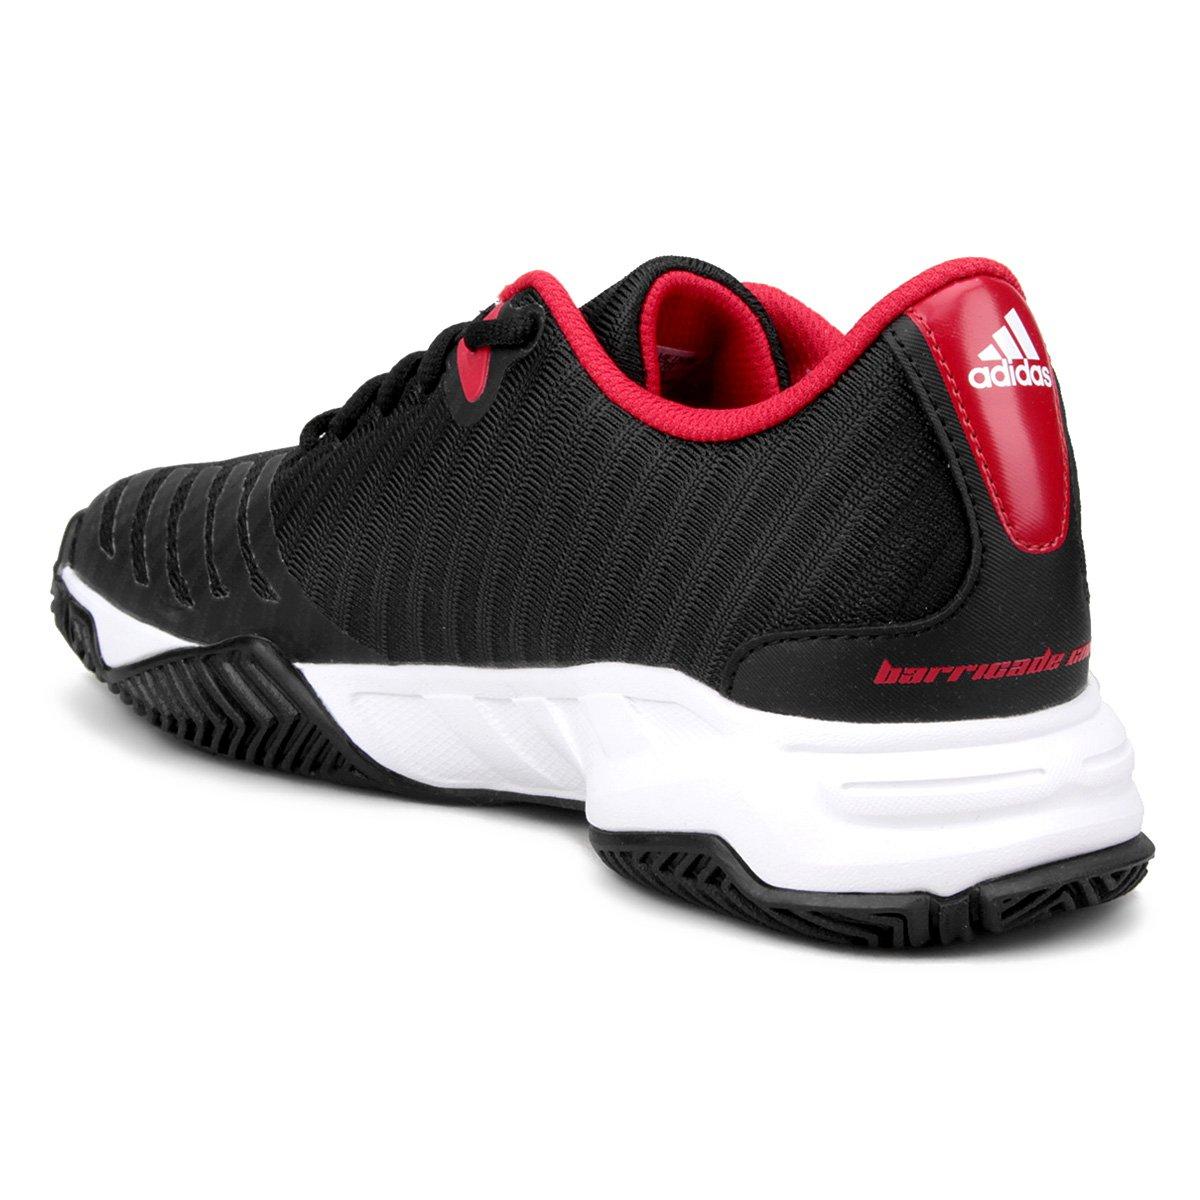 f47c650f30ab8 Tênis Adidas Barricade Court 3 Masculino - Compre Agora | Netshoes